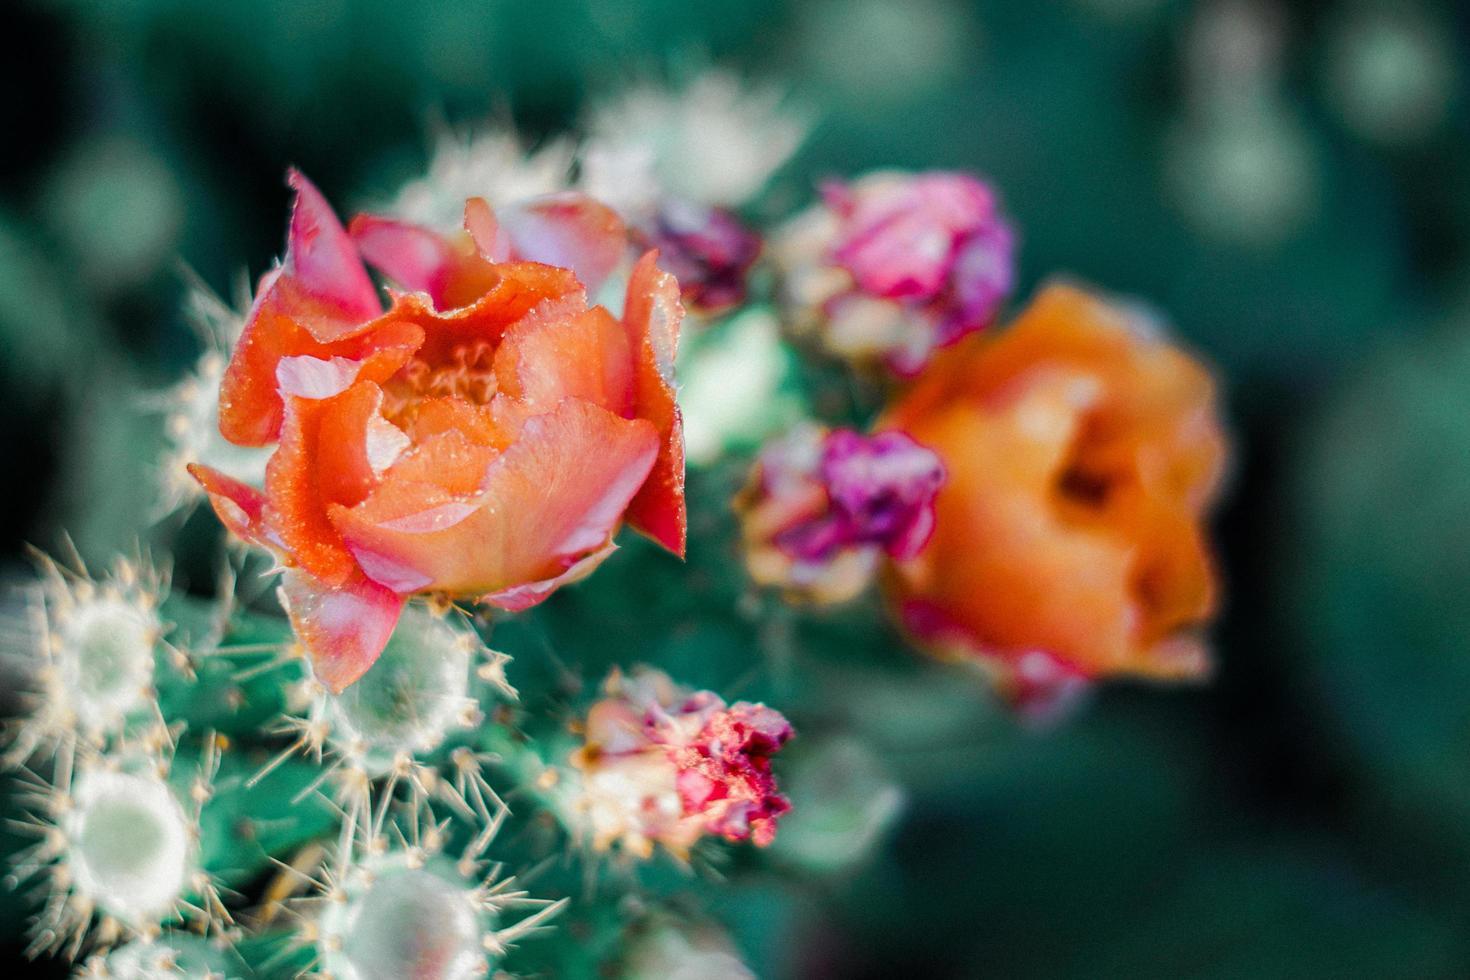 Orange and pink flowers on cactus photo